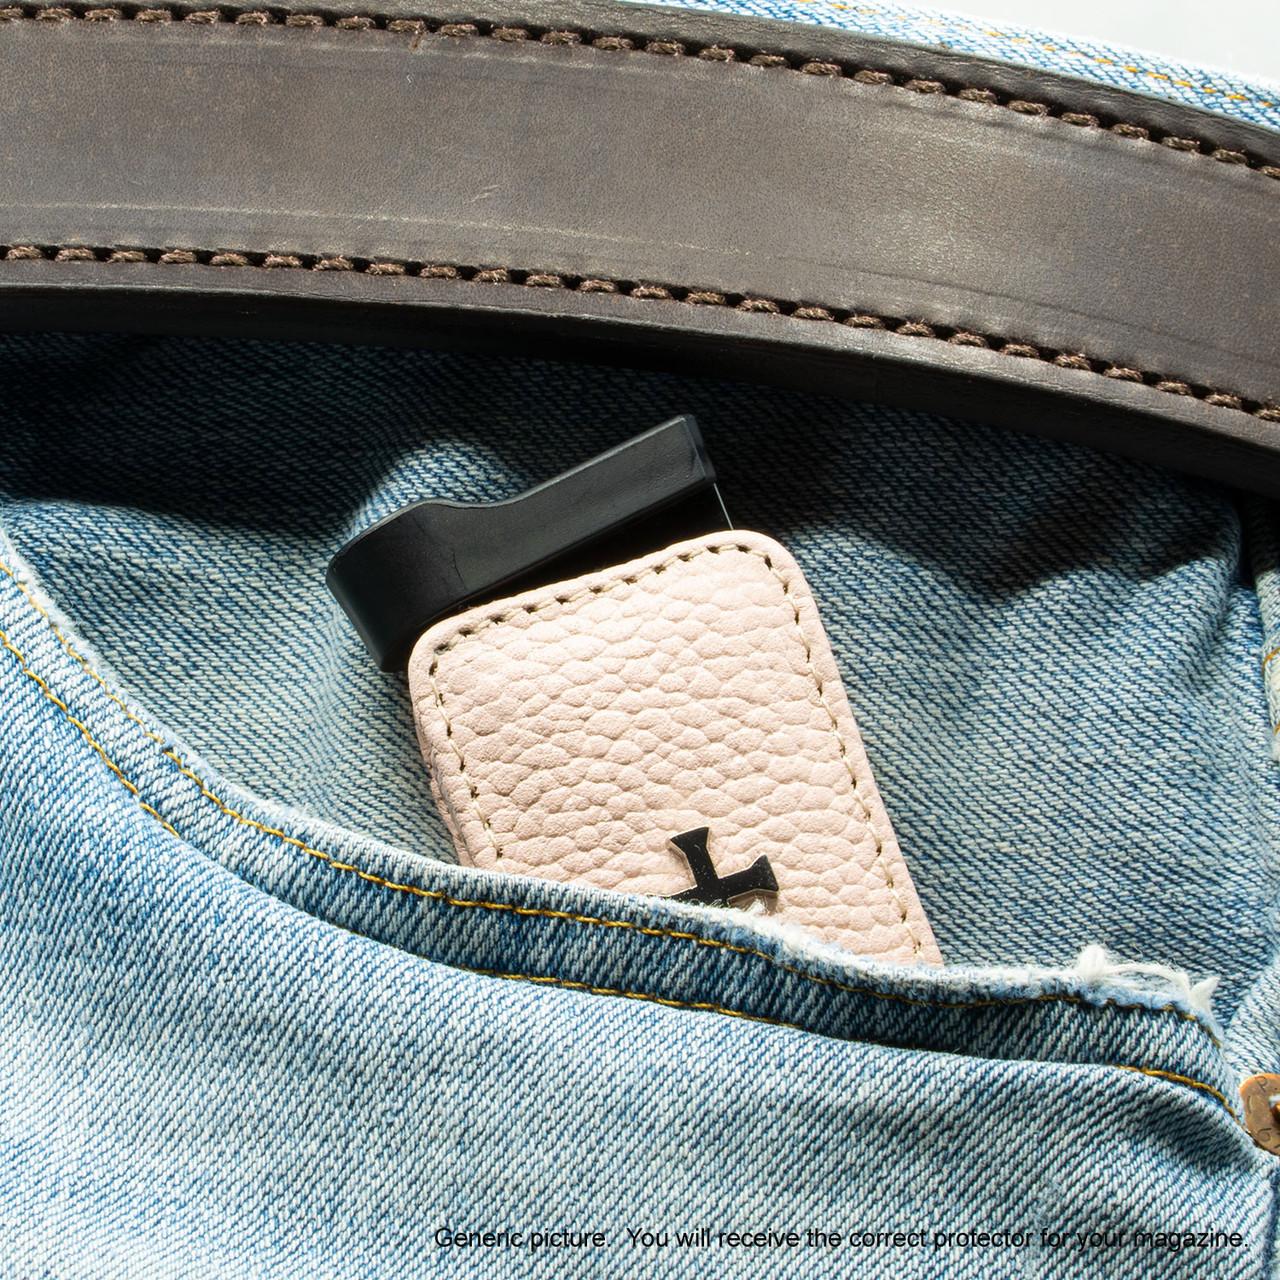 Kahr PM9 Pink Carry Faithfully Cross Magazine Pocket Protector